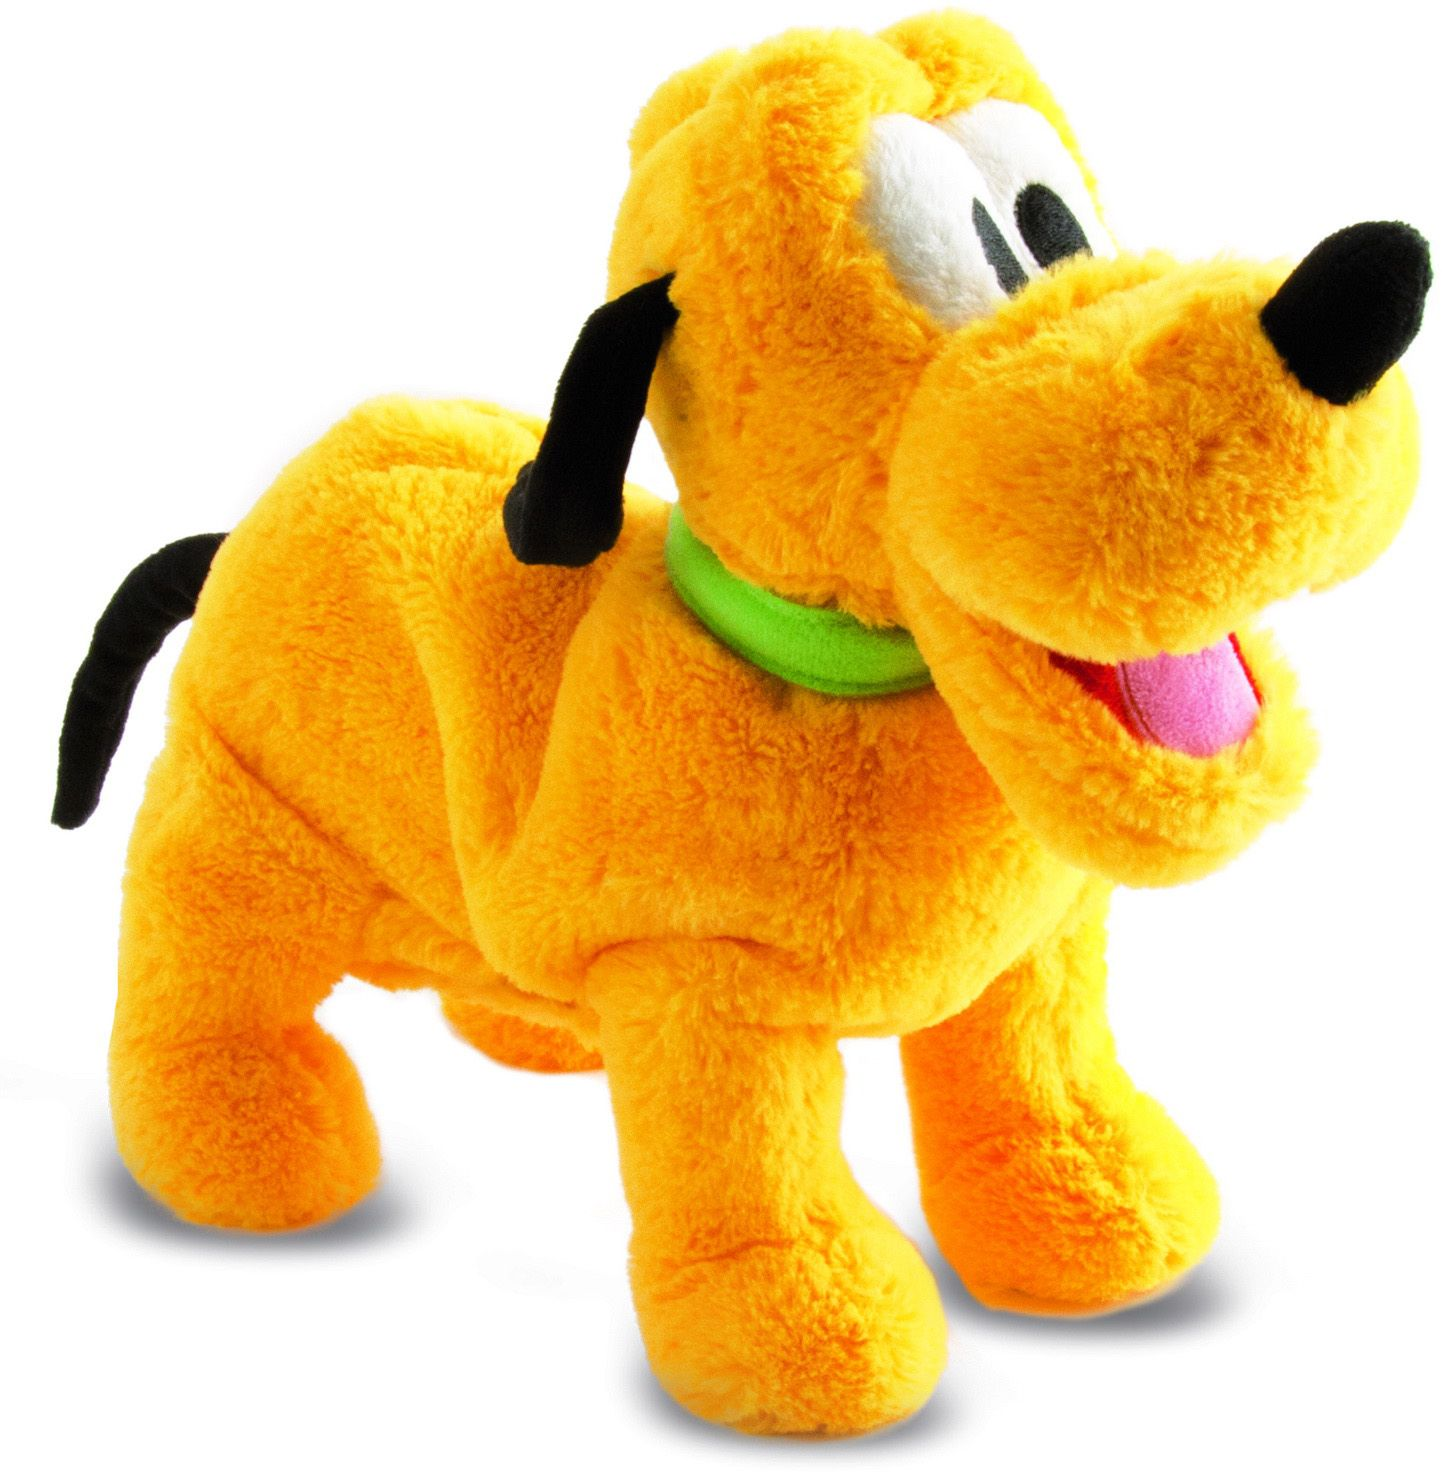 IMC TOYS IMC Toys Plüschtier mit Funktion, »Club Petz Funny Pluto«